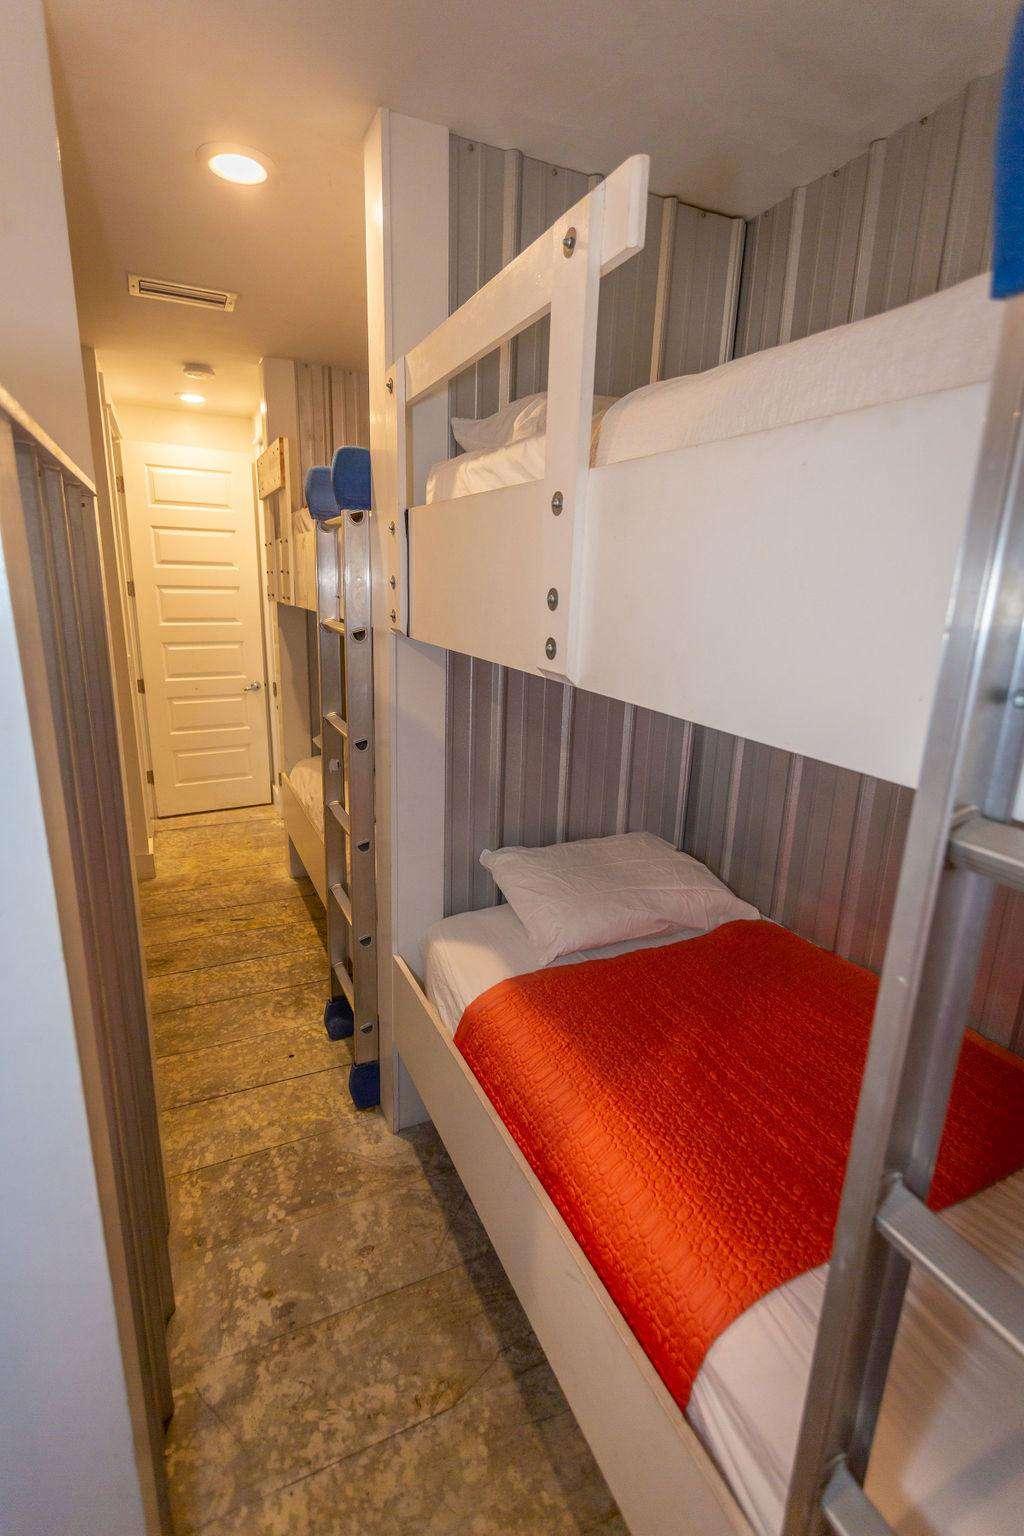 br # 3 has 3 sets of bunks/bath/private exit